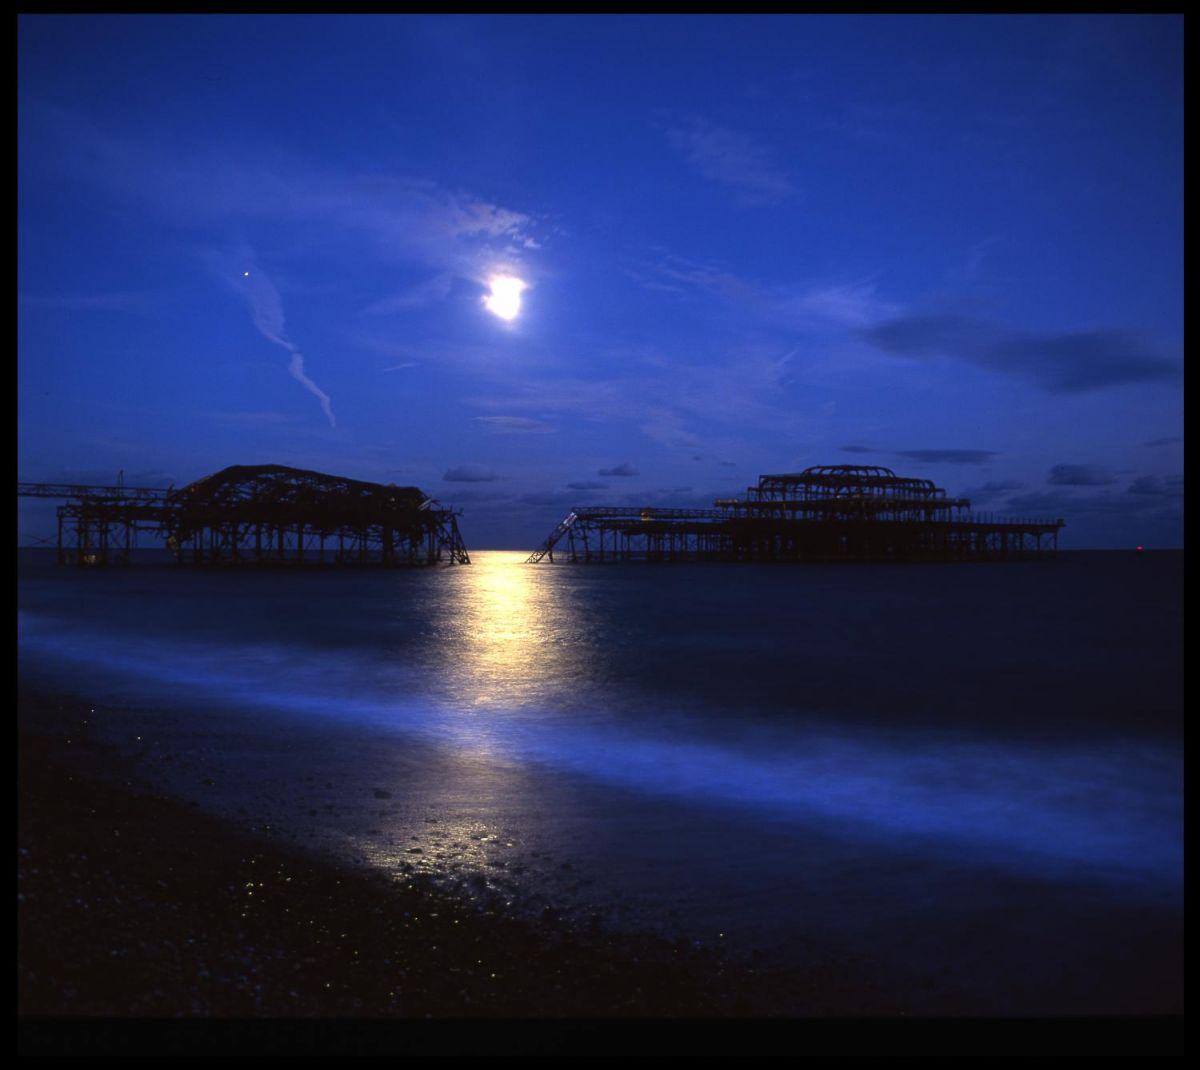 Moon&Pier